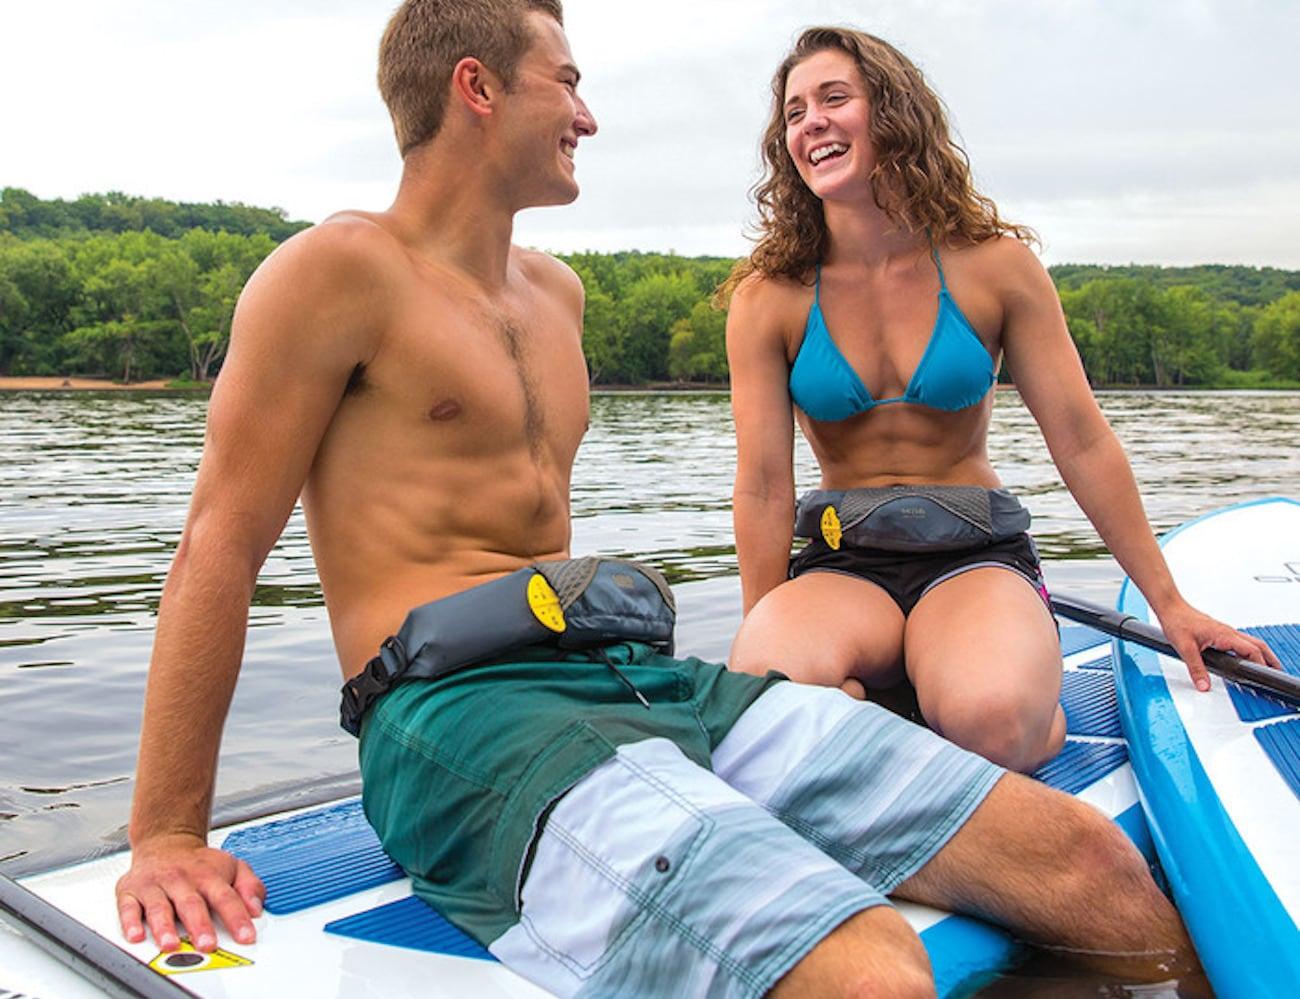 Onyx M-16 Belt Pack Inflatable Life Jacket keeps you afloat